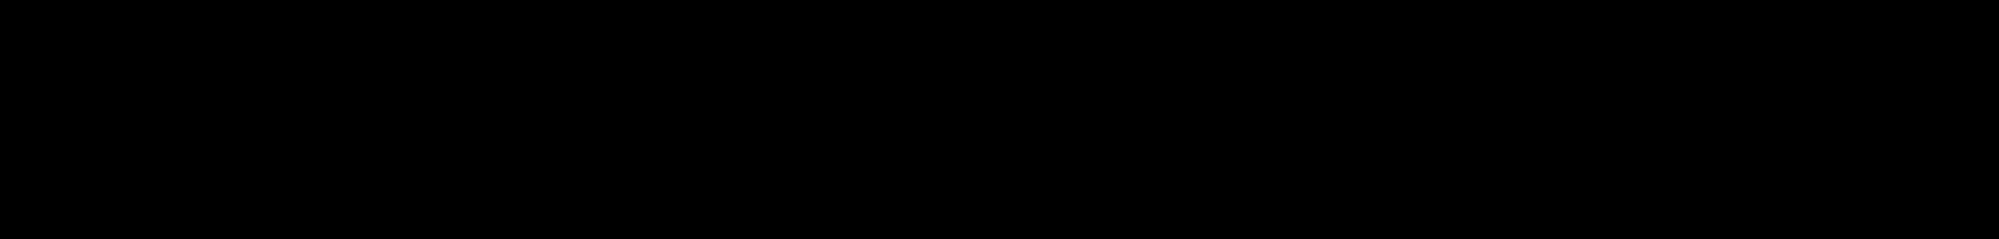 image28.png